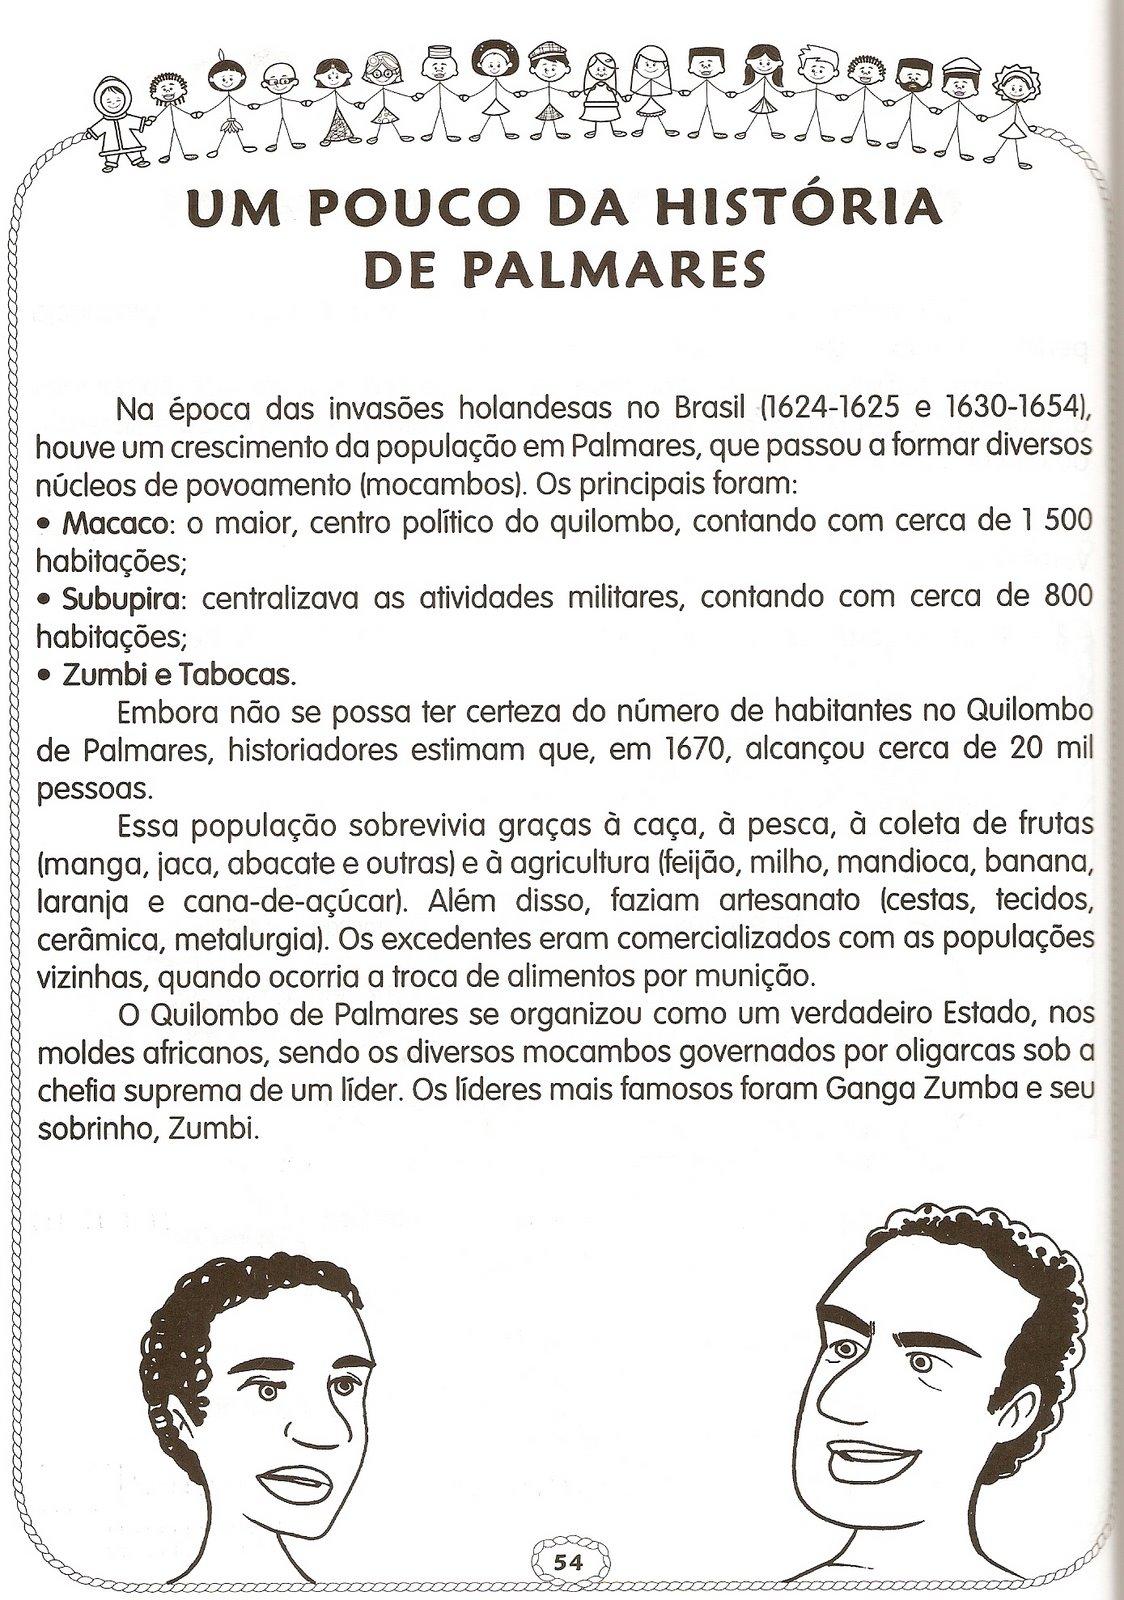 Atividades sobre Consciência Negra - Zumbi - Quilombo dos palmares